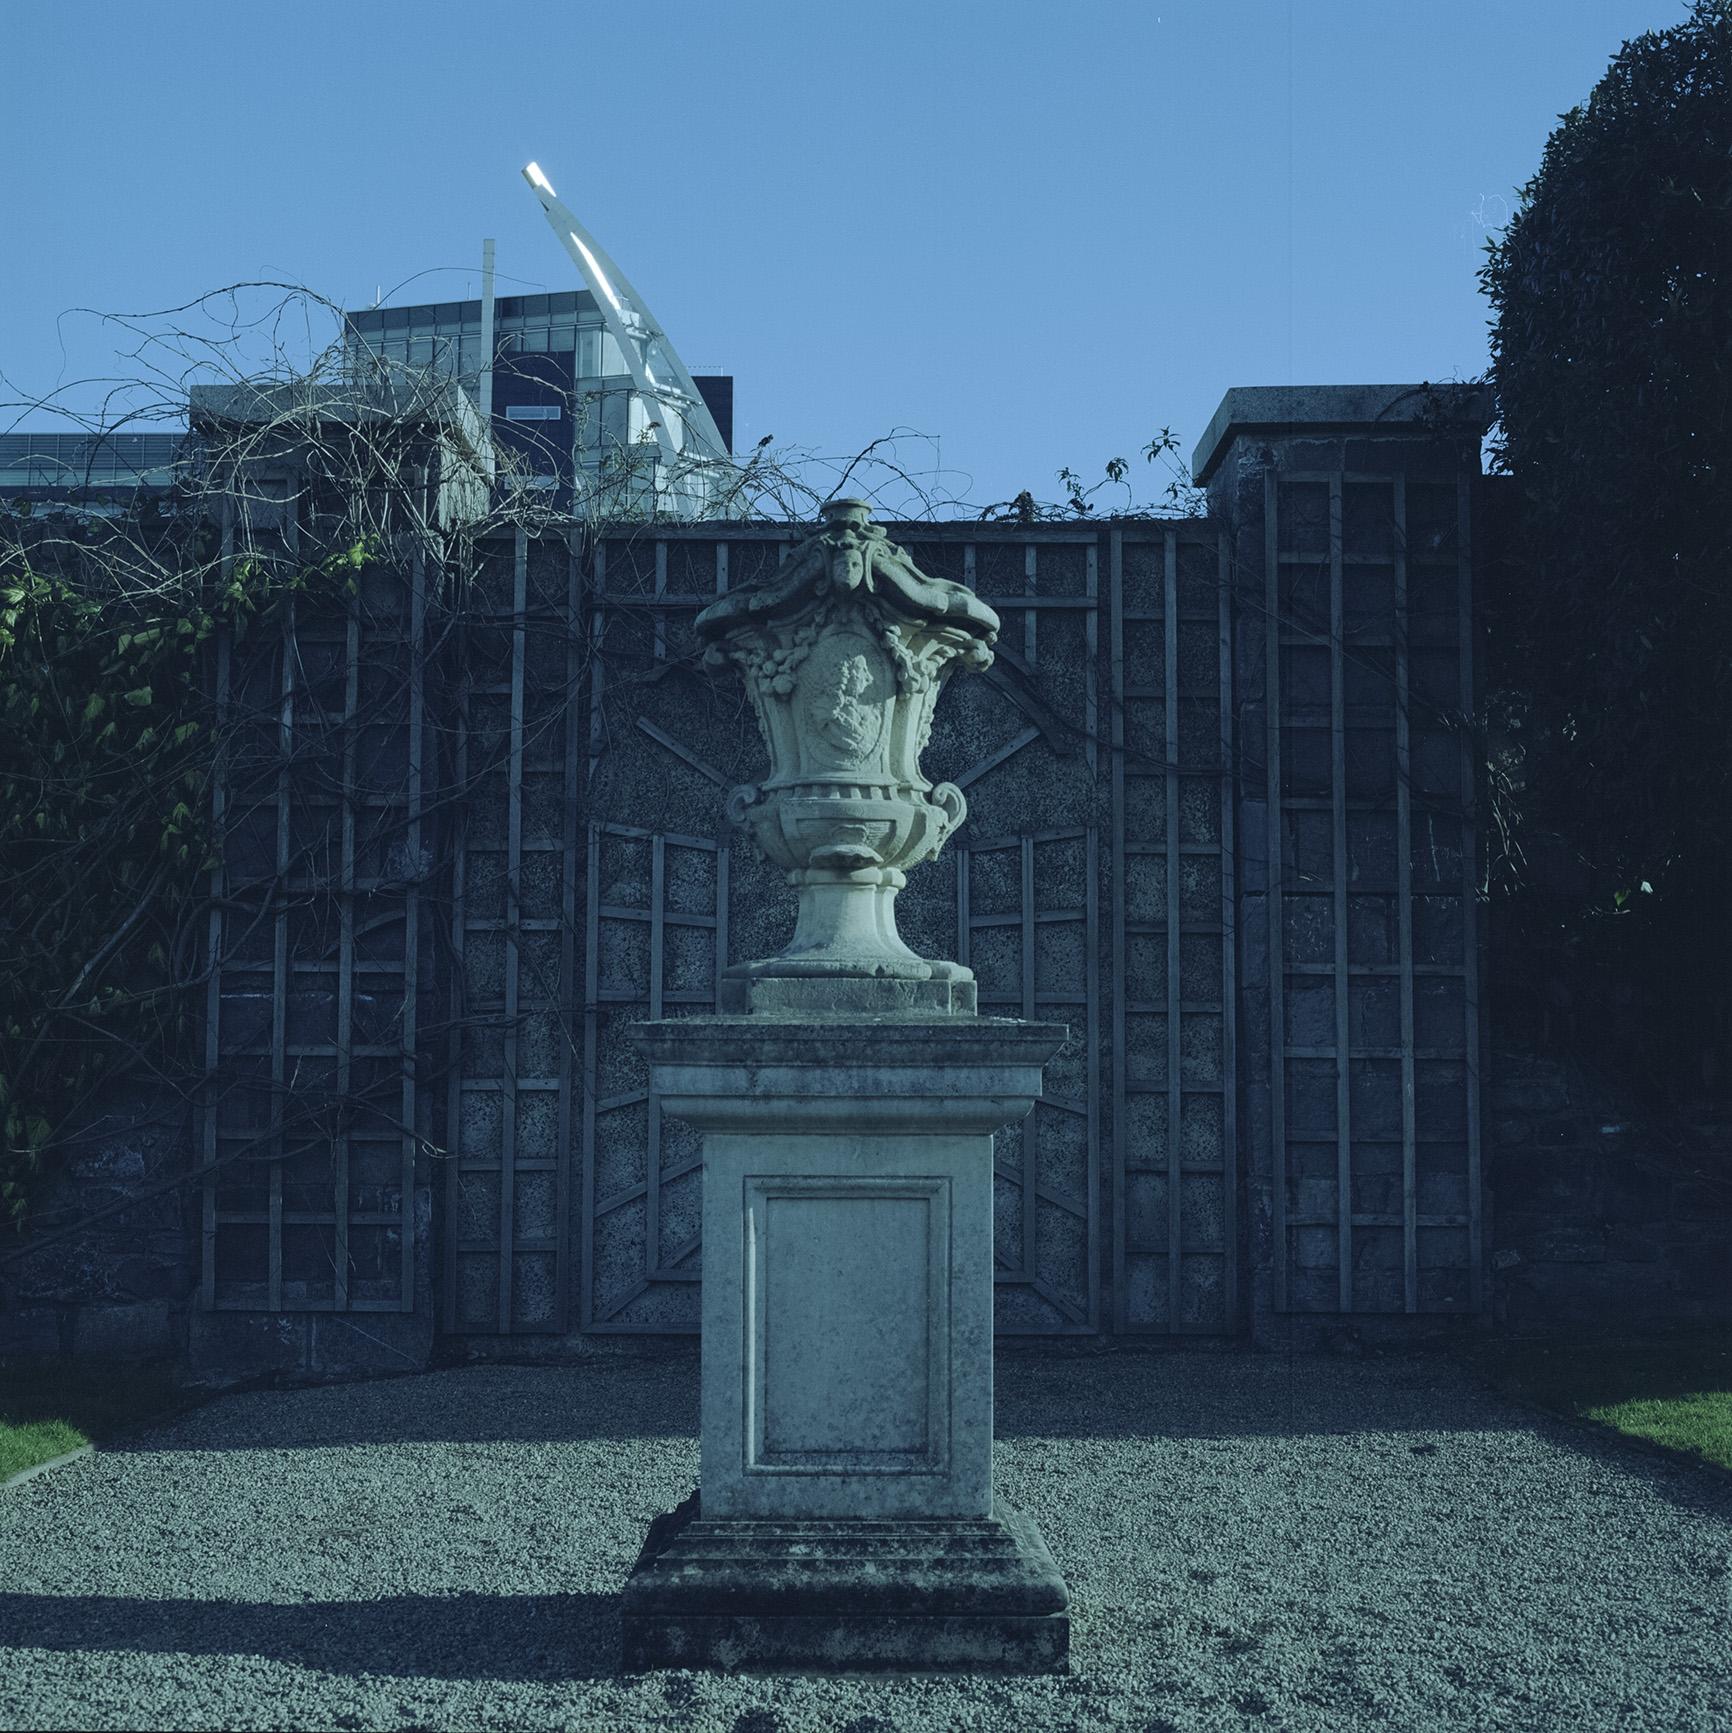 IMMA_Formal_Gardens_6.jpg